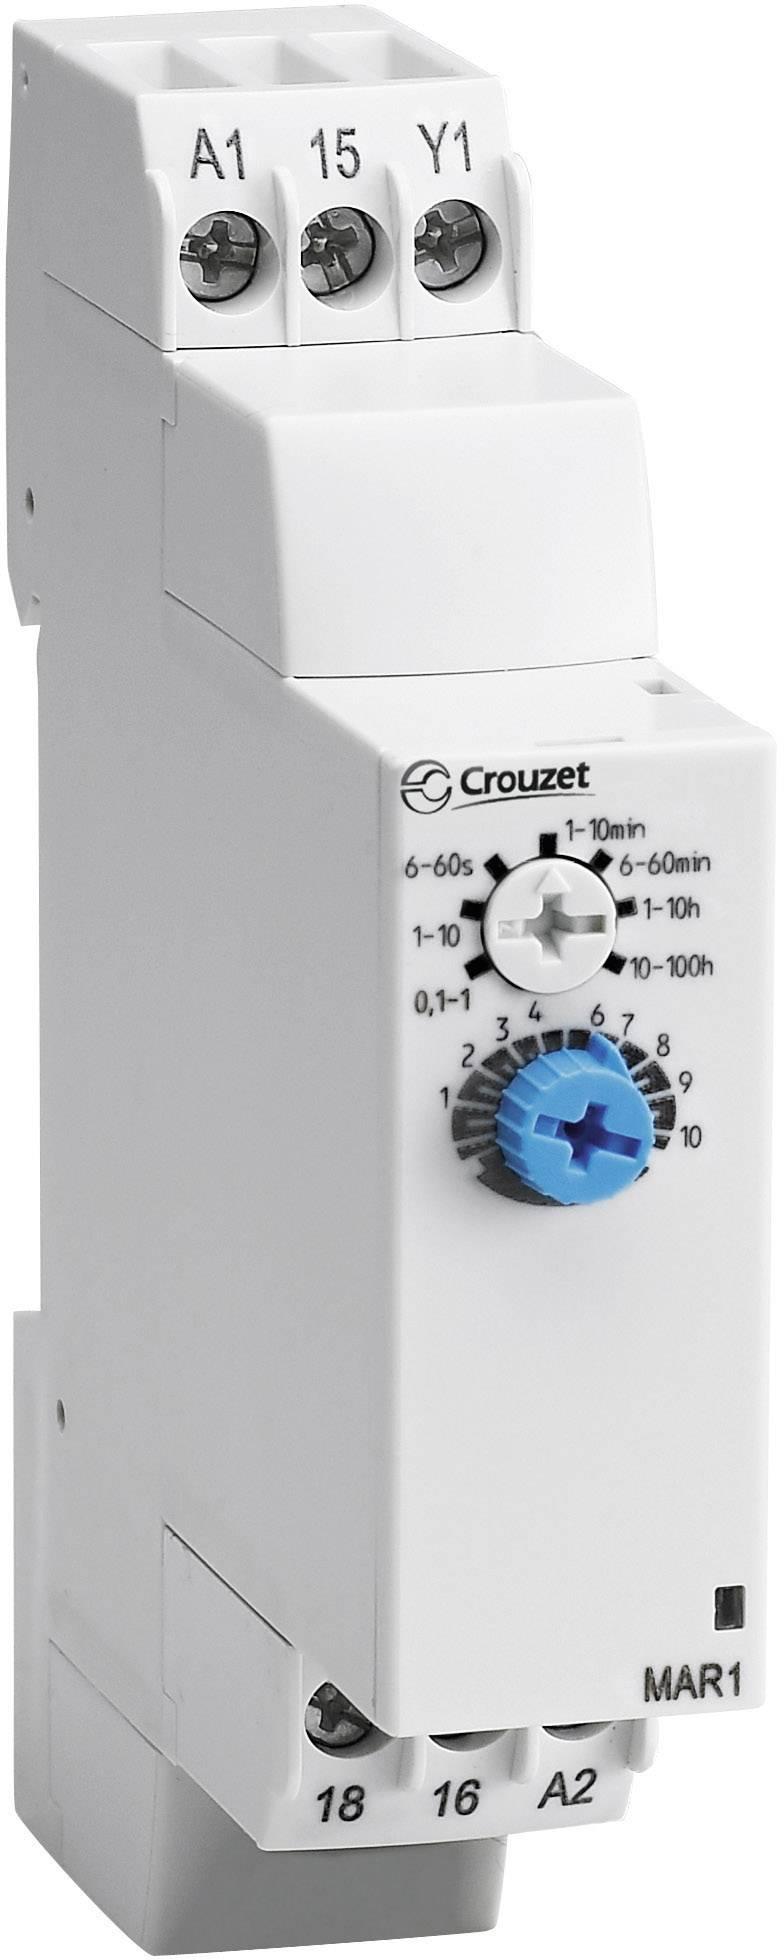 Elektronické časové relé Crouzet, 88827135, MCR1, 8 A, 8 A DC/AC , 250 V DC/AC 2000 VA/ 80 W